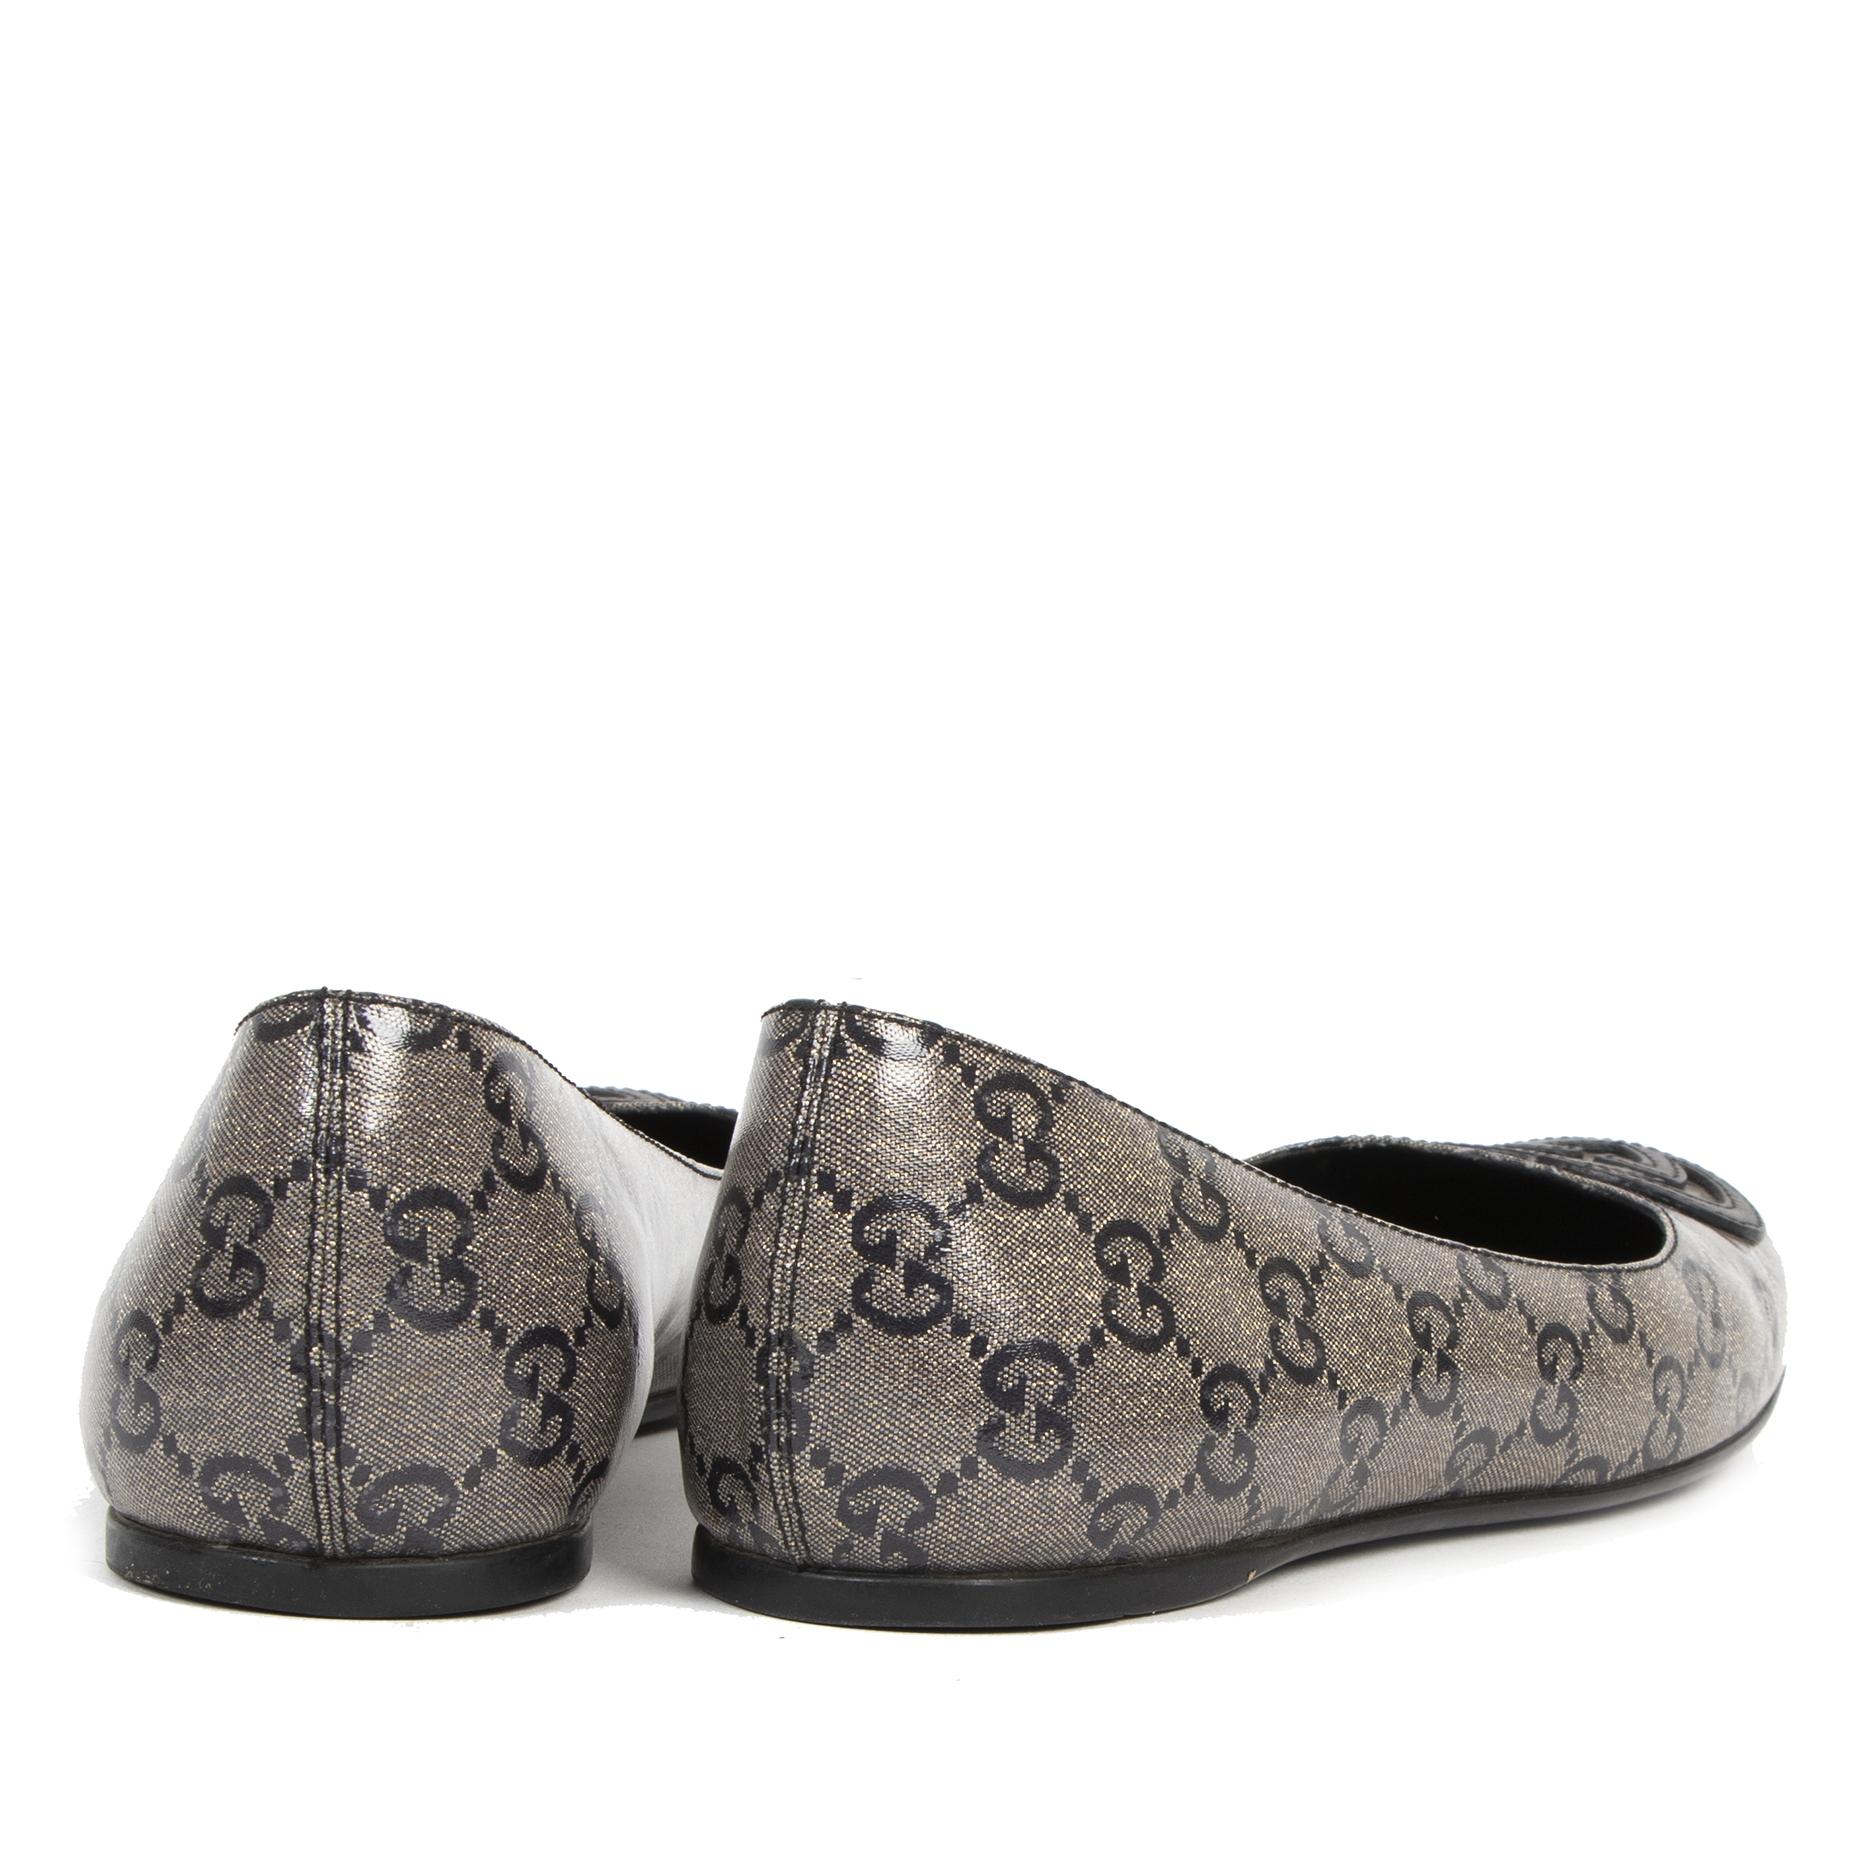 Gucci Monogram Ballerina Flats - Size 36